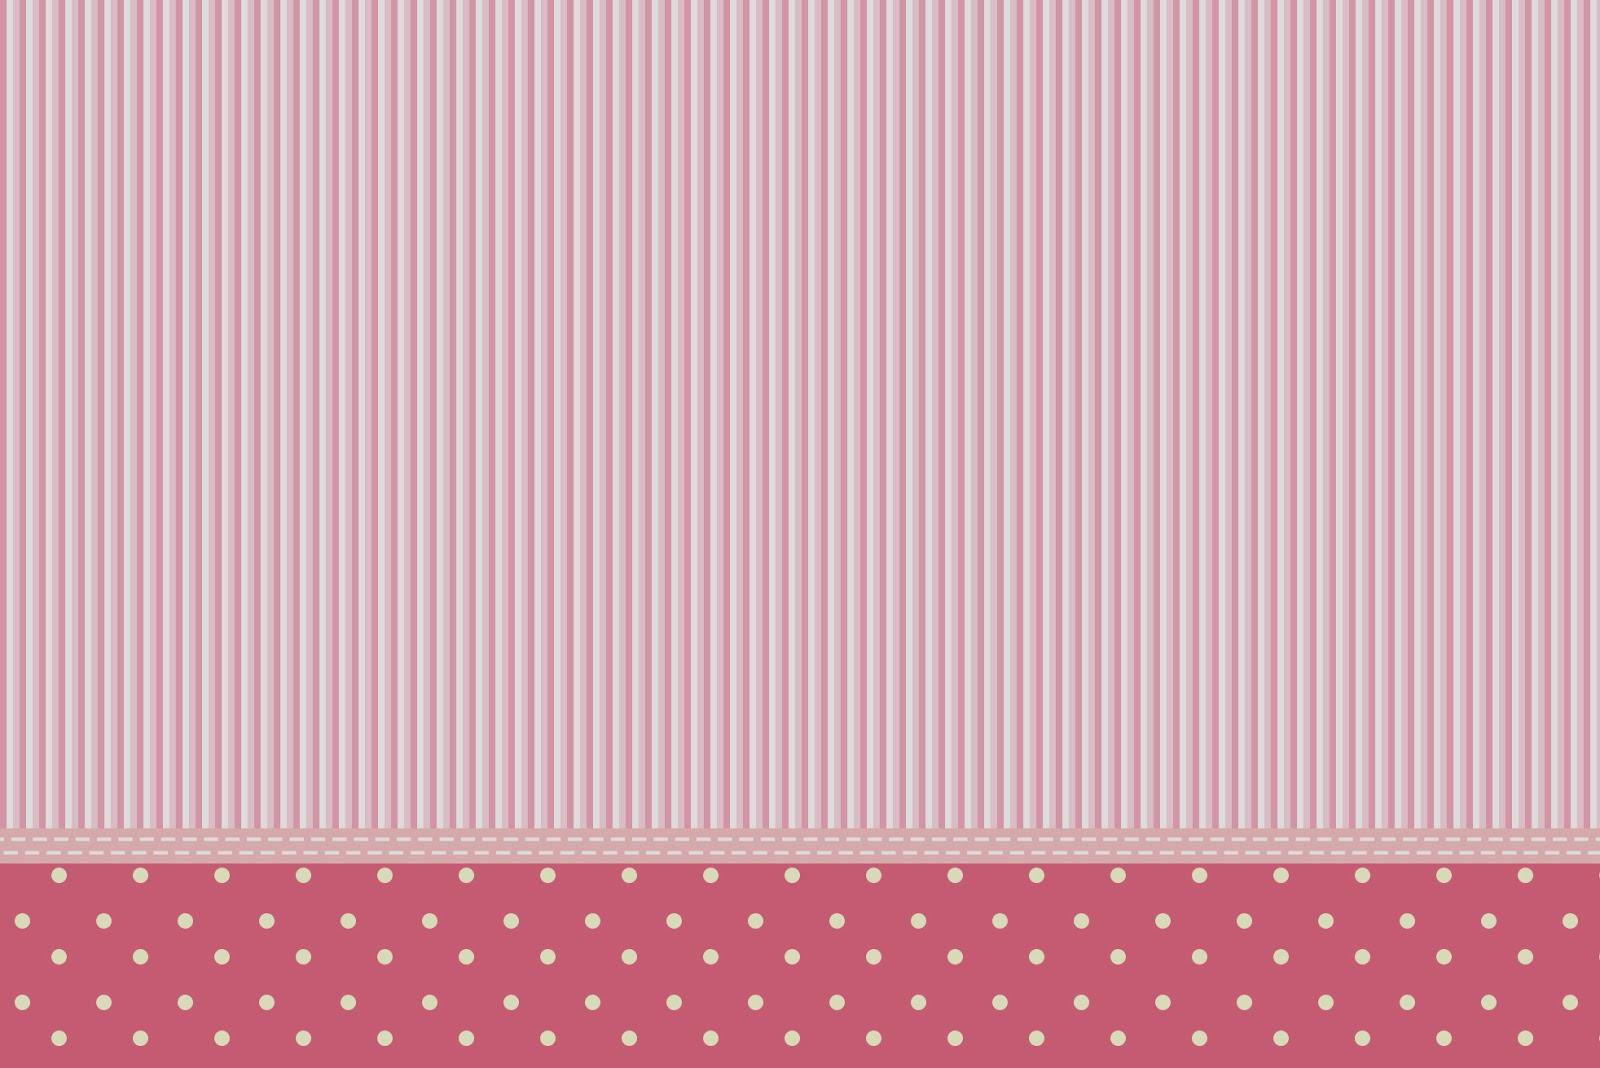 Free Printable Pink Polka Dot Stripes